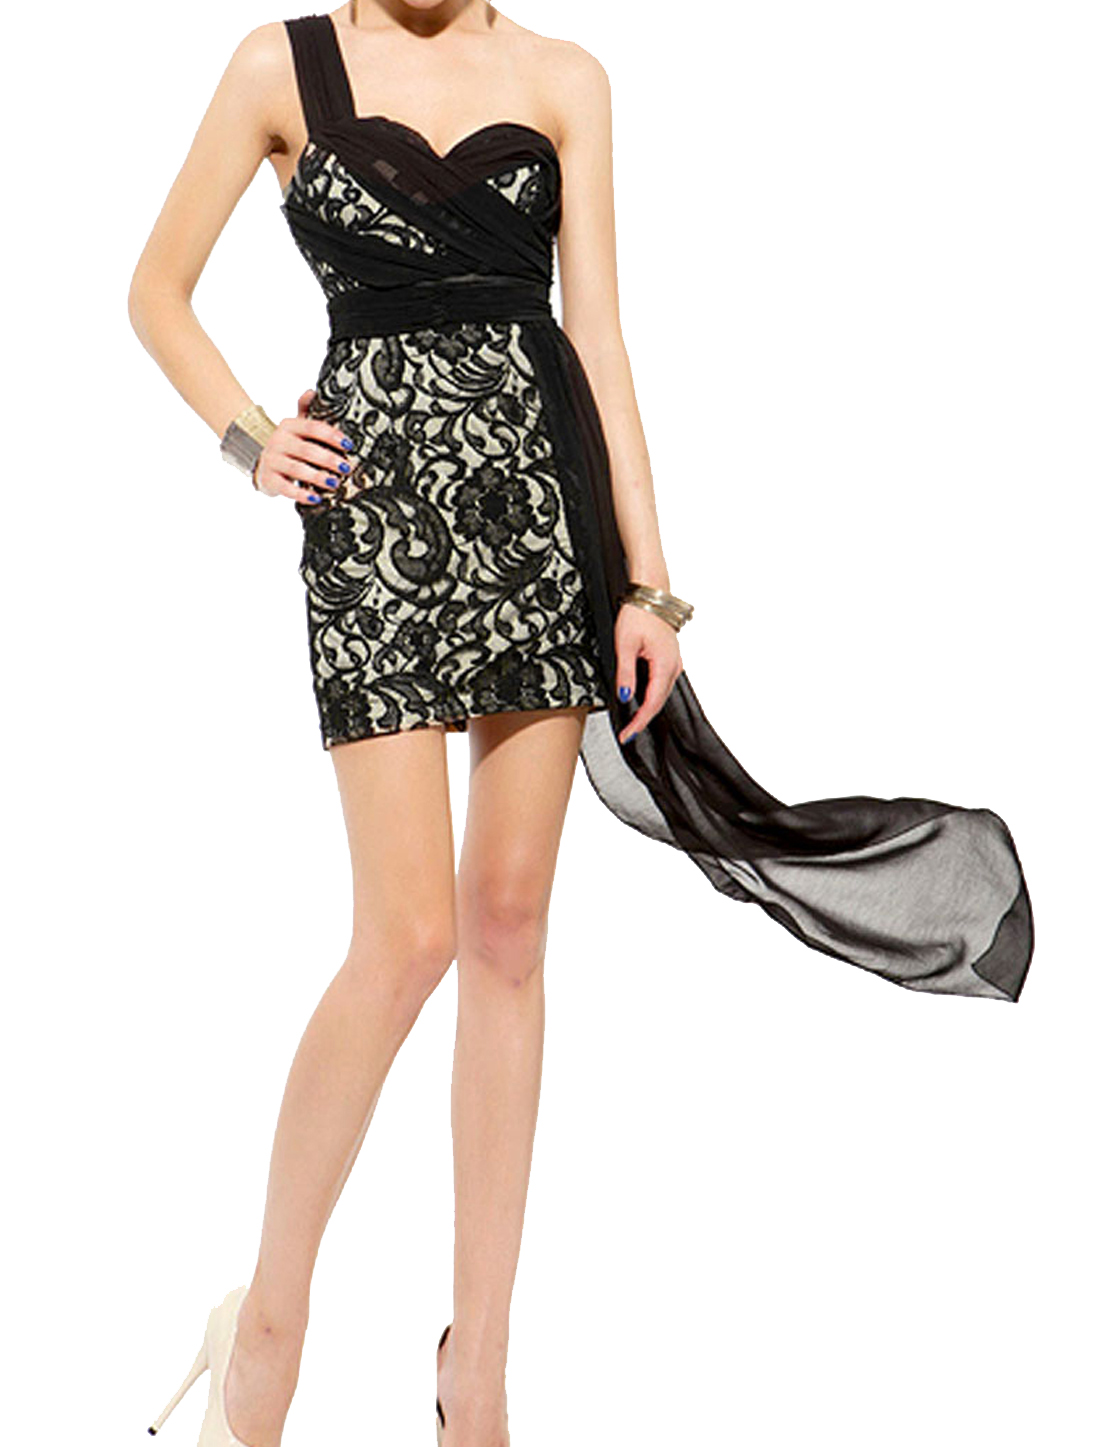 Ladies Leisure Sheevesless Sheath Wasit Padded Bust Mini Dress Black XS